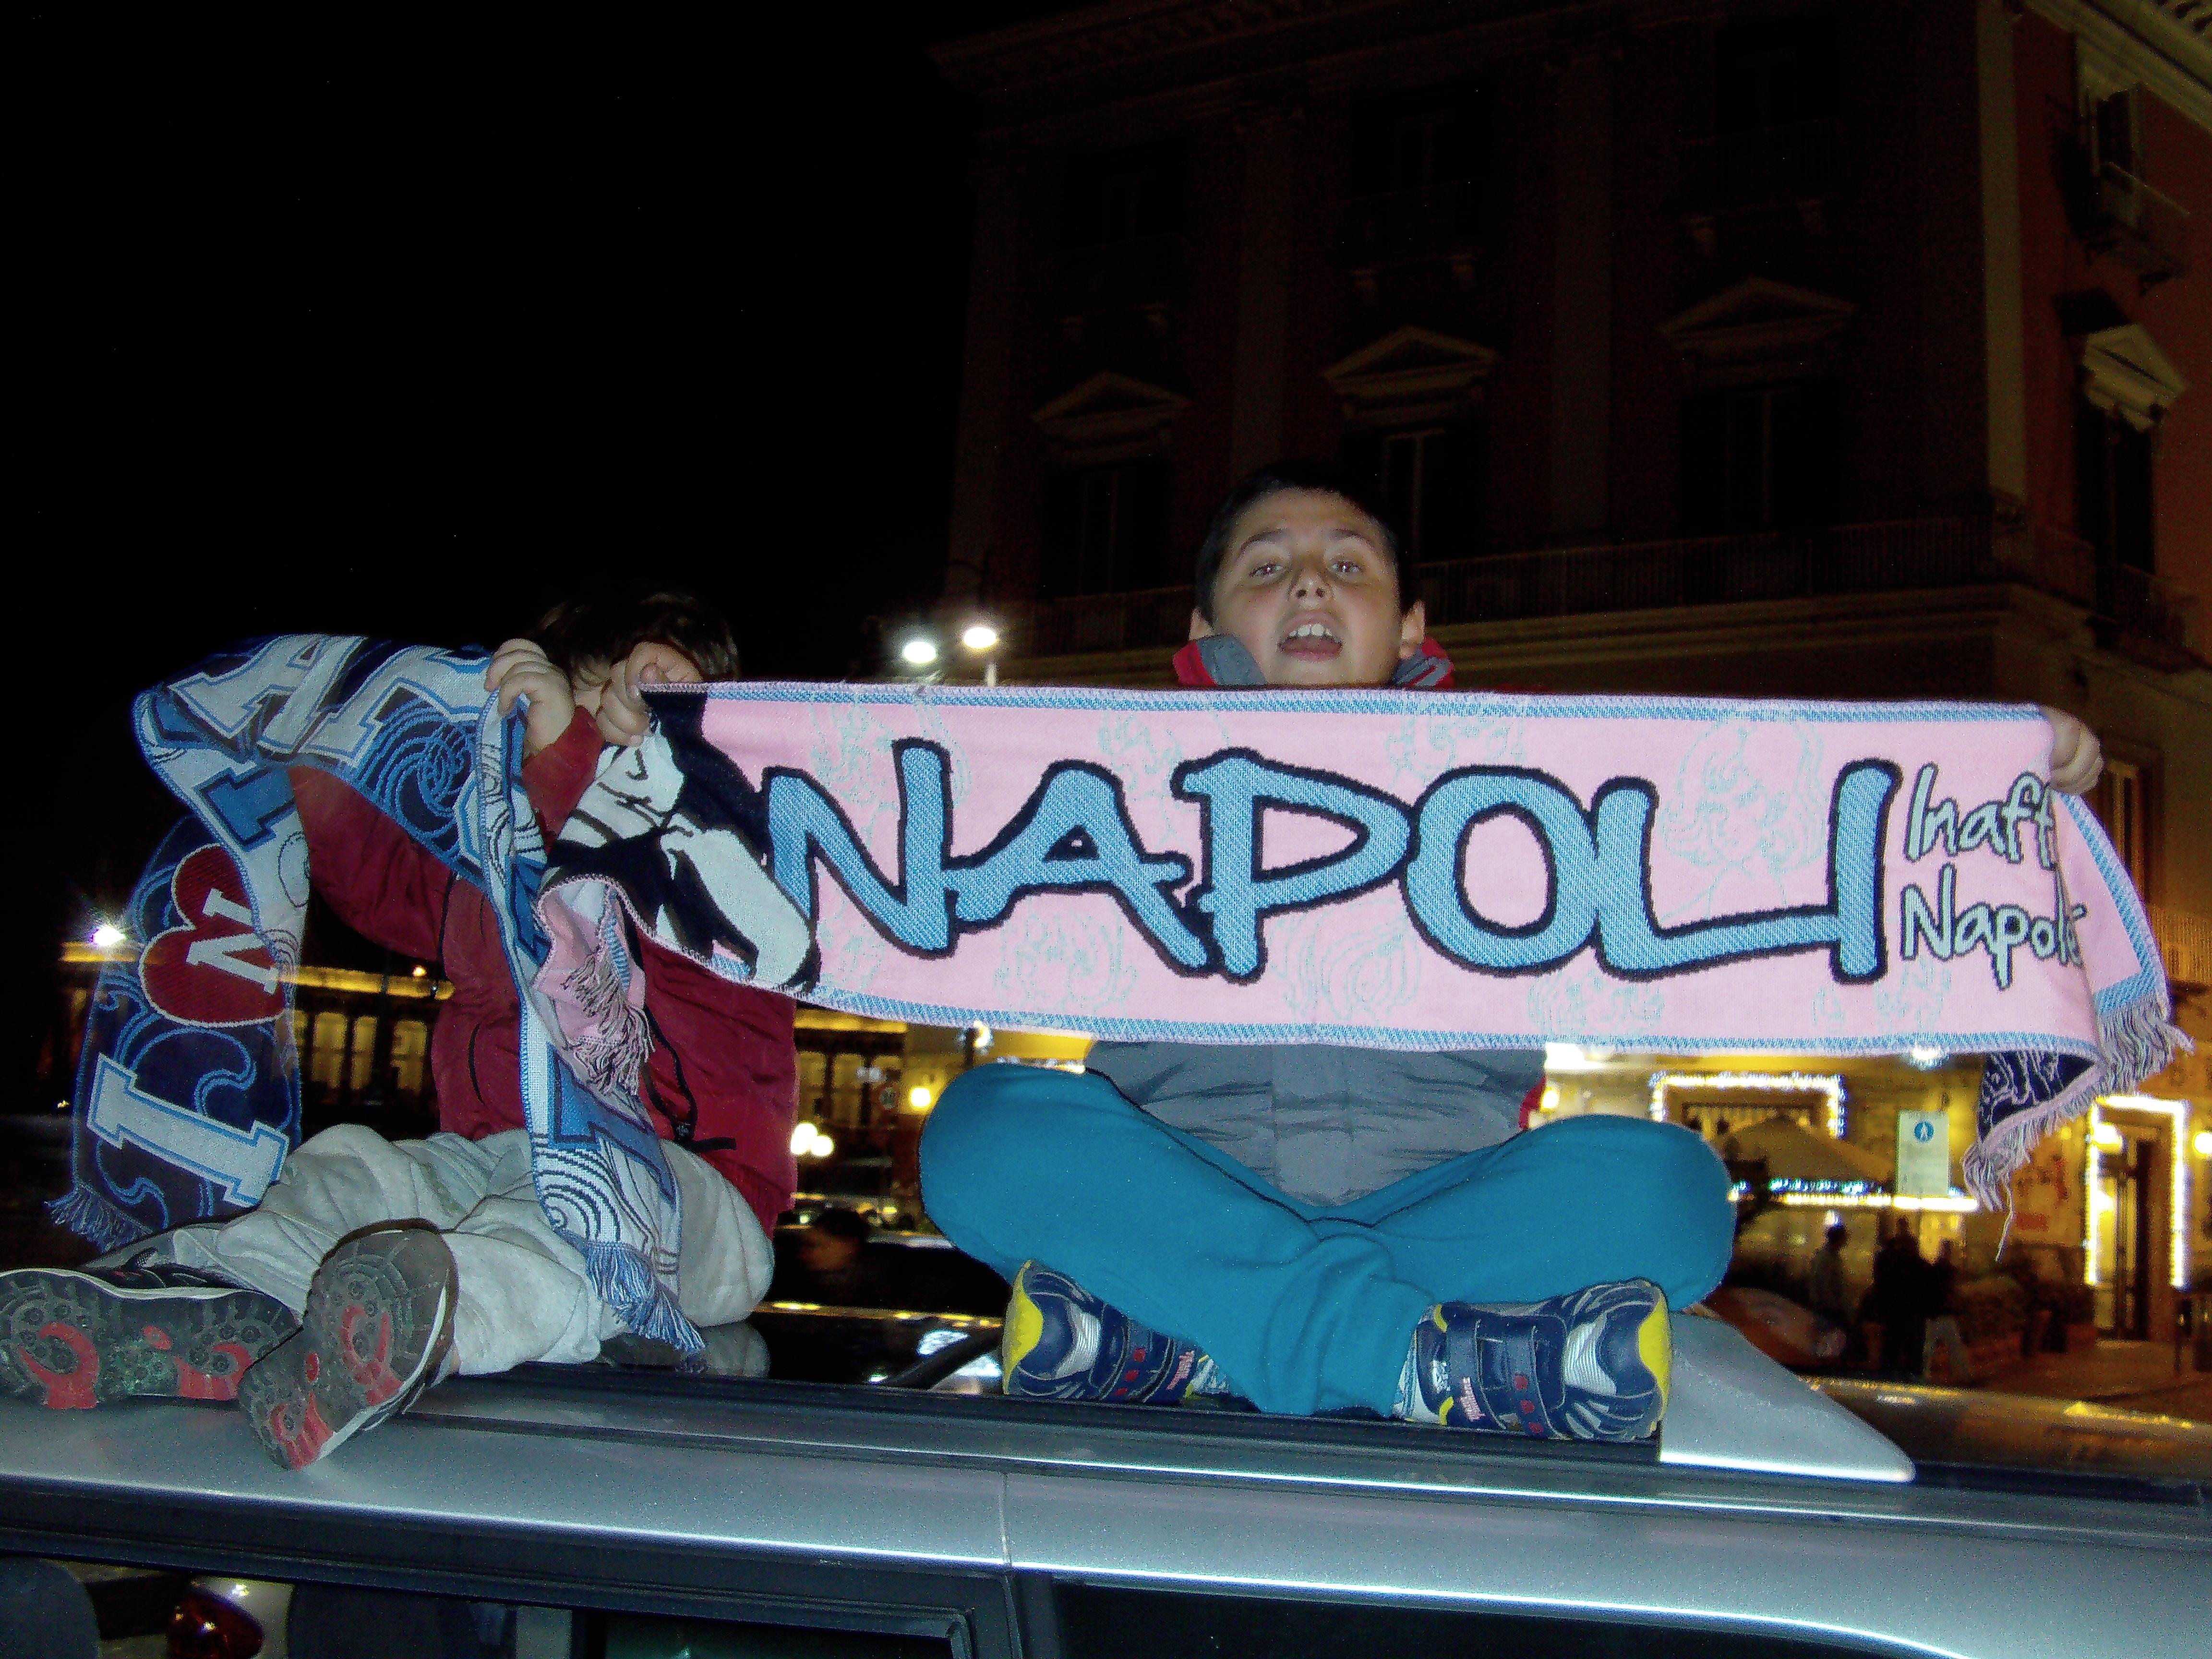 Napoli nella storia, gli azzurri volano agli ottavi di Champions